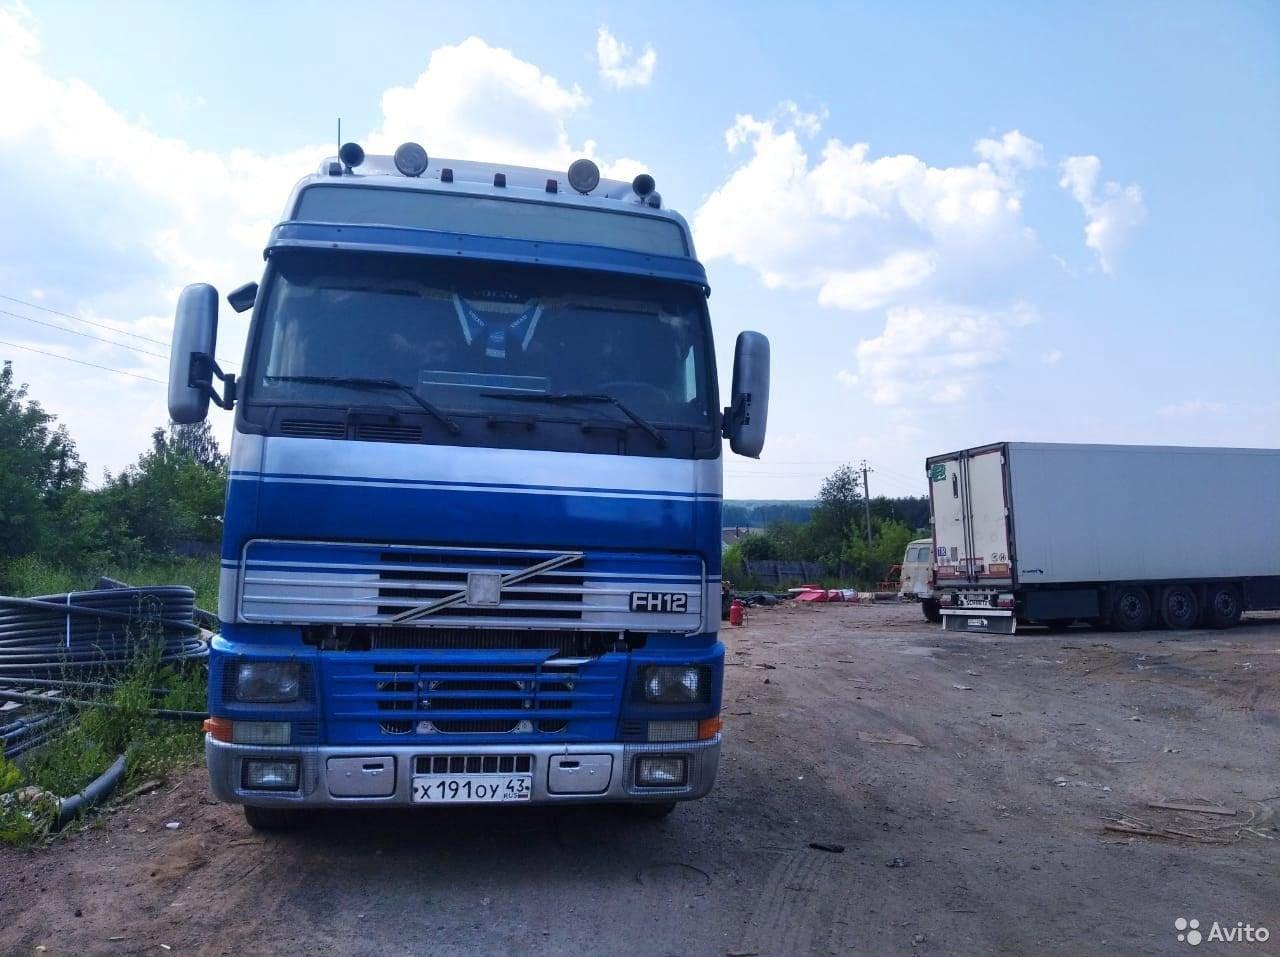 Volvo-420-in-Rusland-(3)